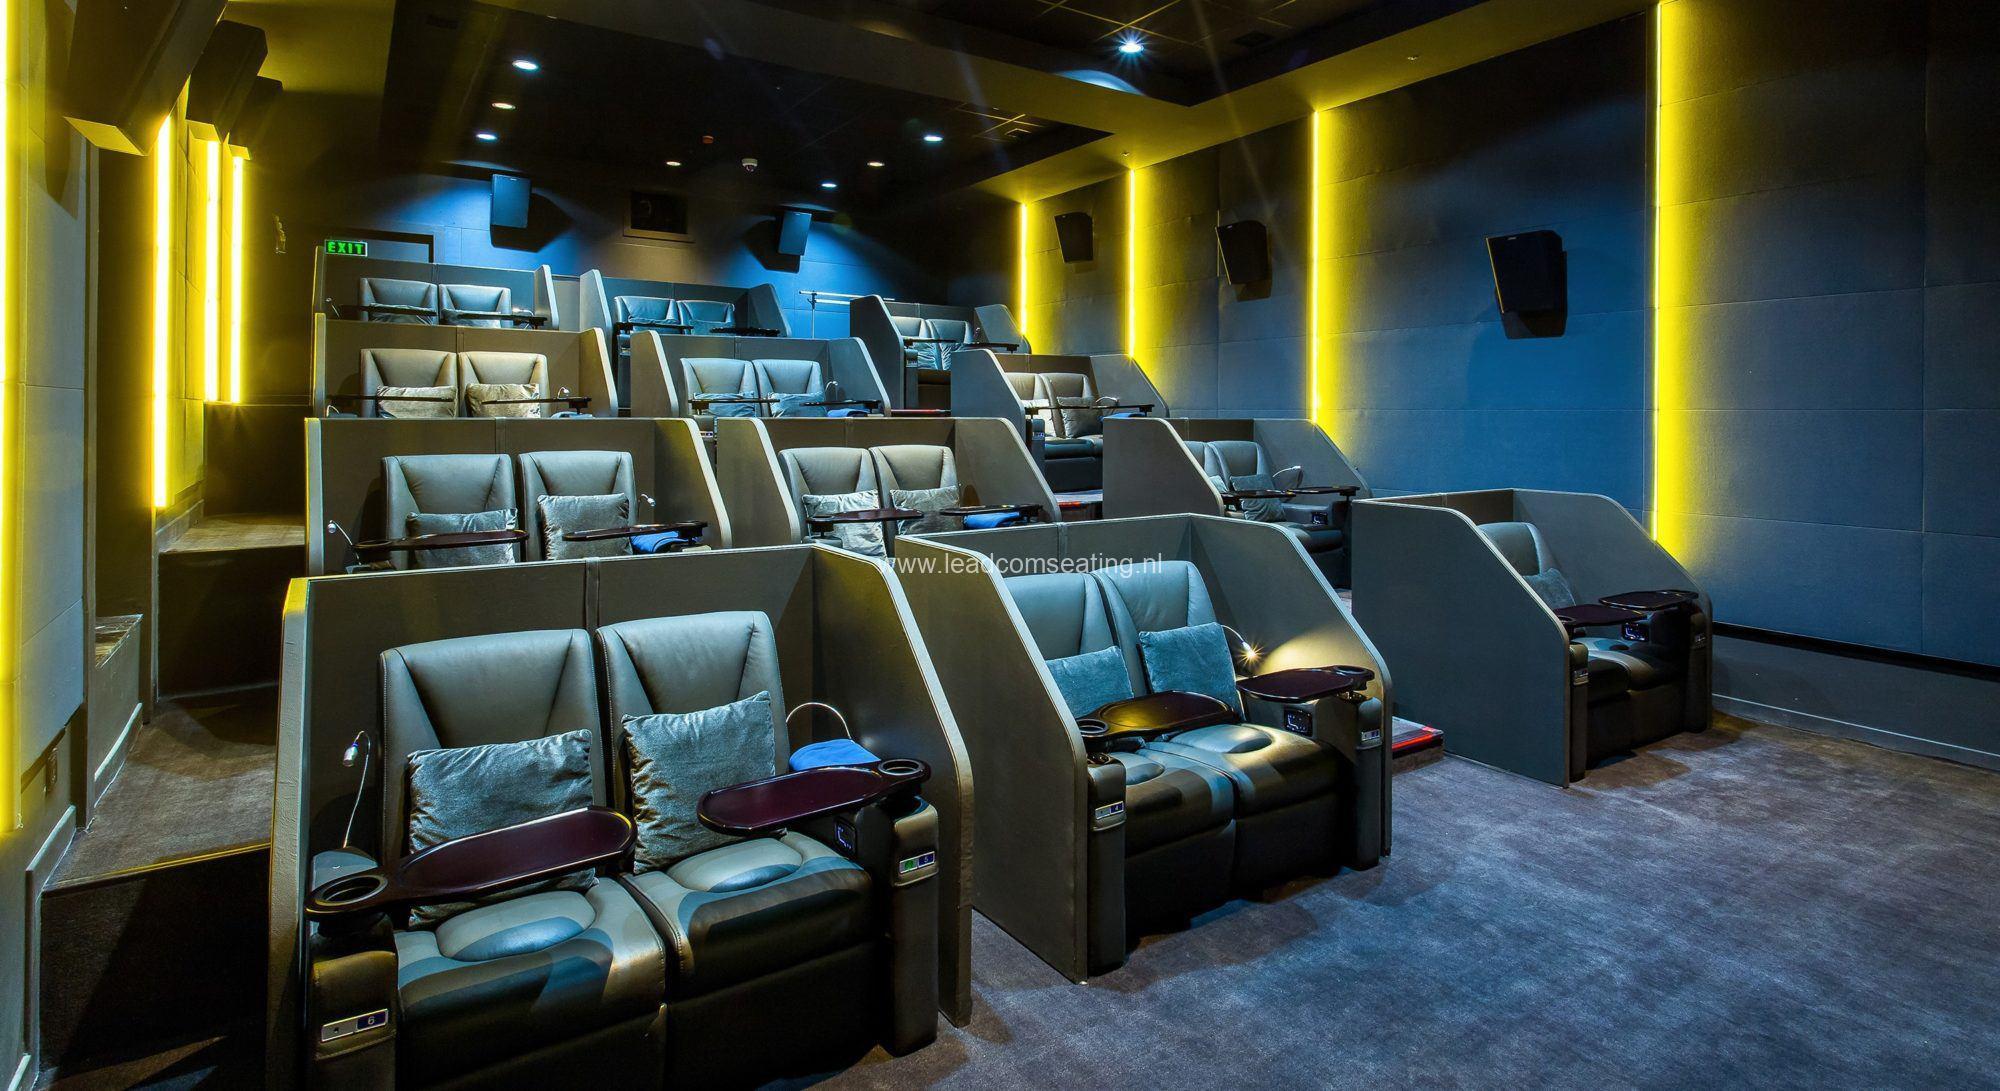 Installation-pictures-for-Prime-Cineplex